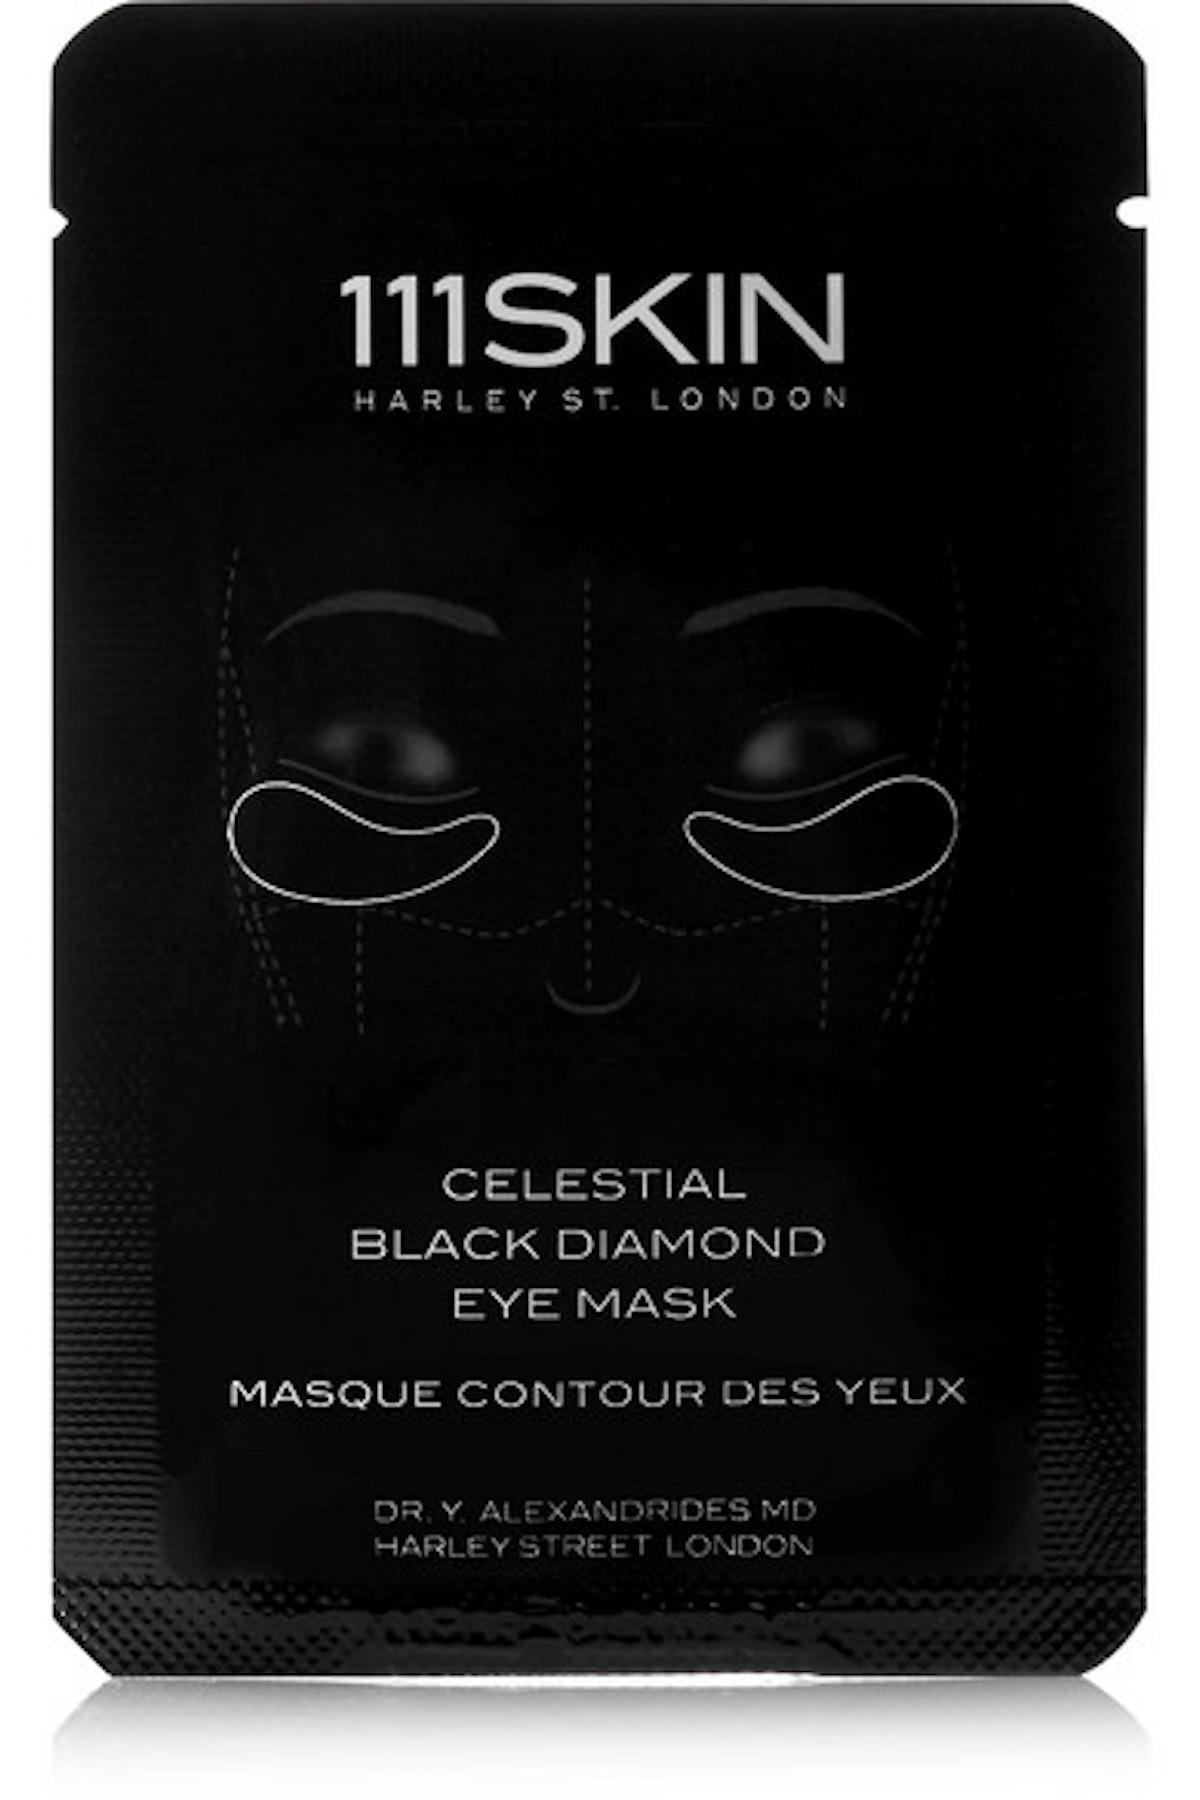 Celestial Black Diamond Eye Mask